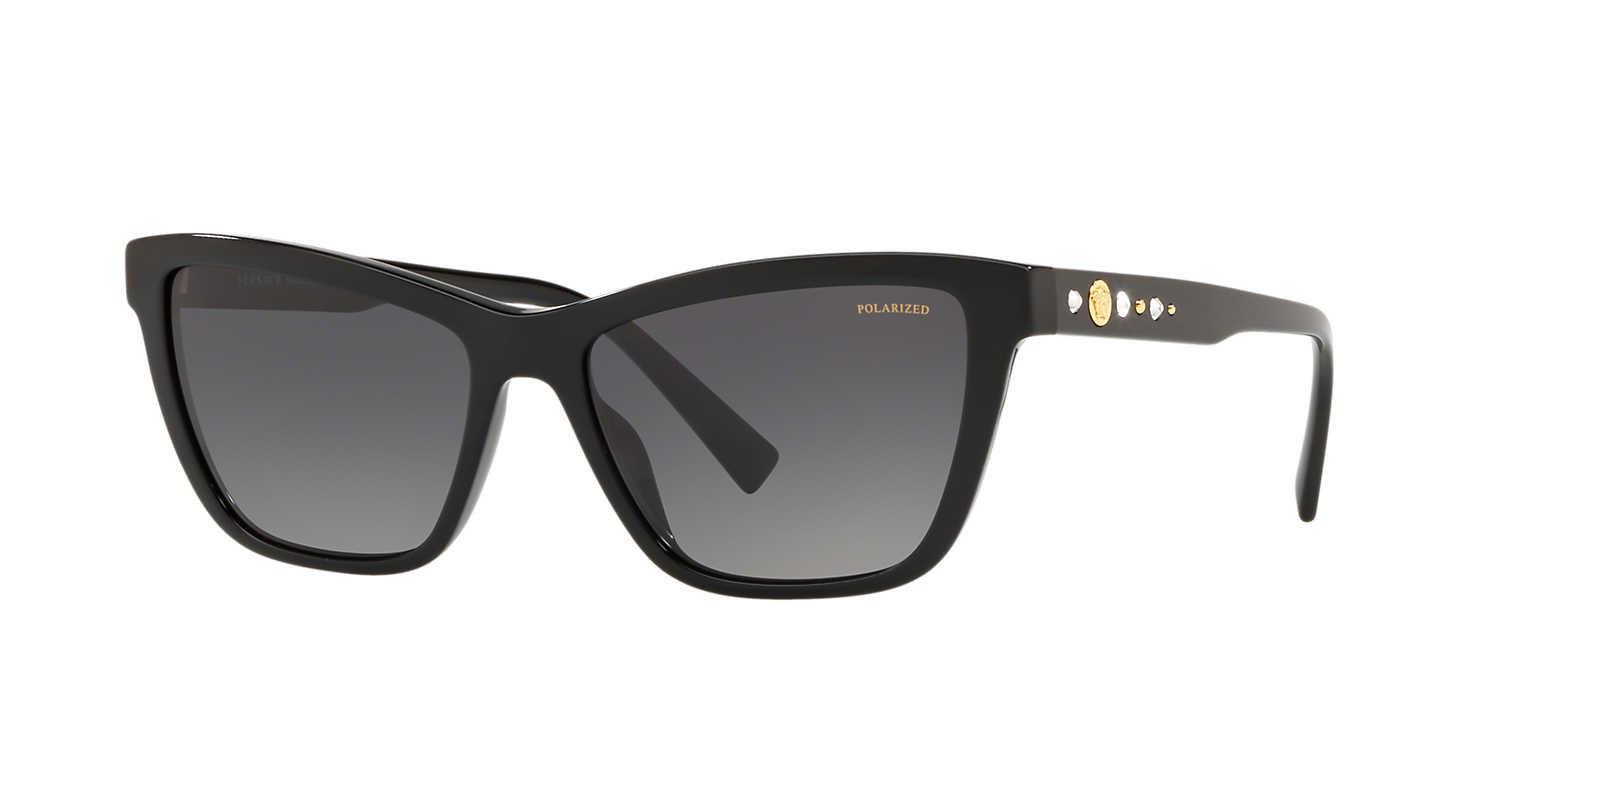 45f907f7a6 Versace Sunglass Ve4354b 55 in Gray - Lyst